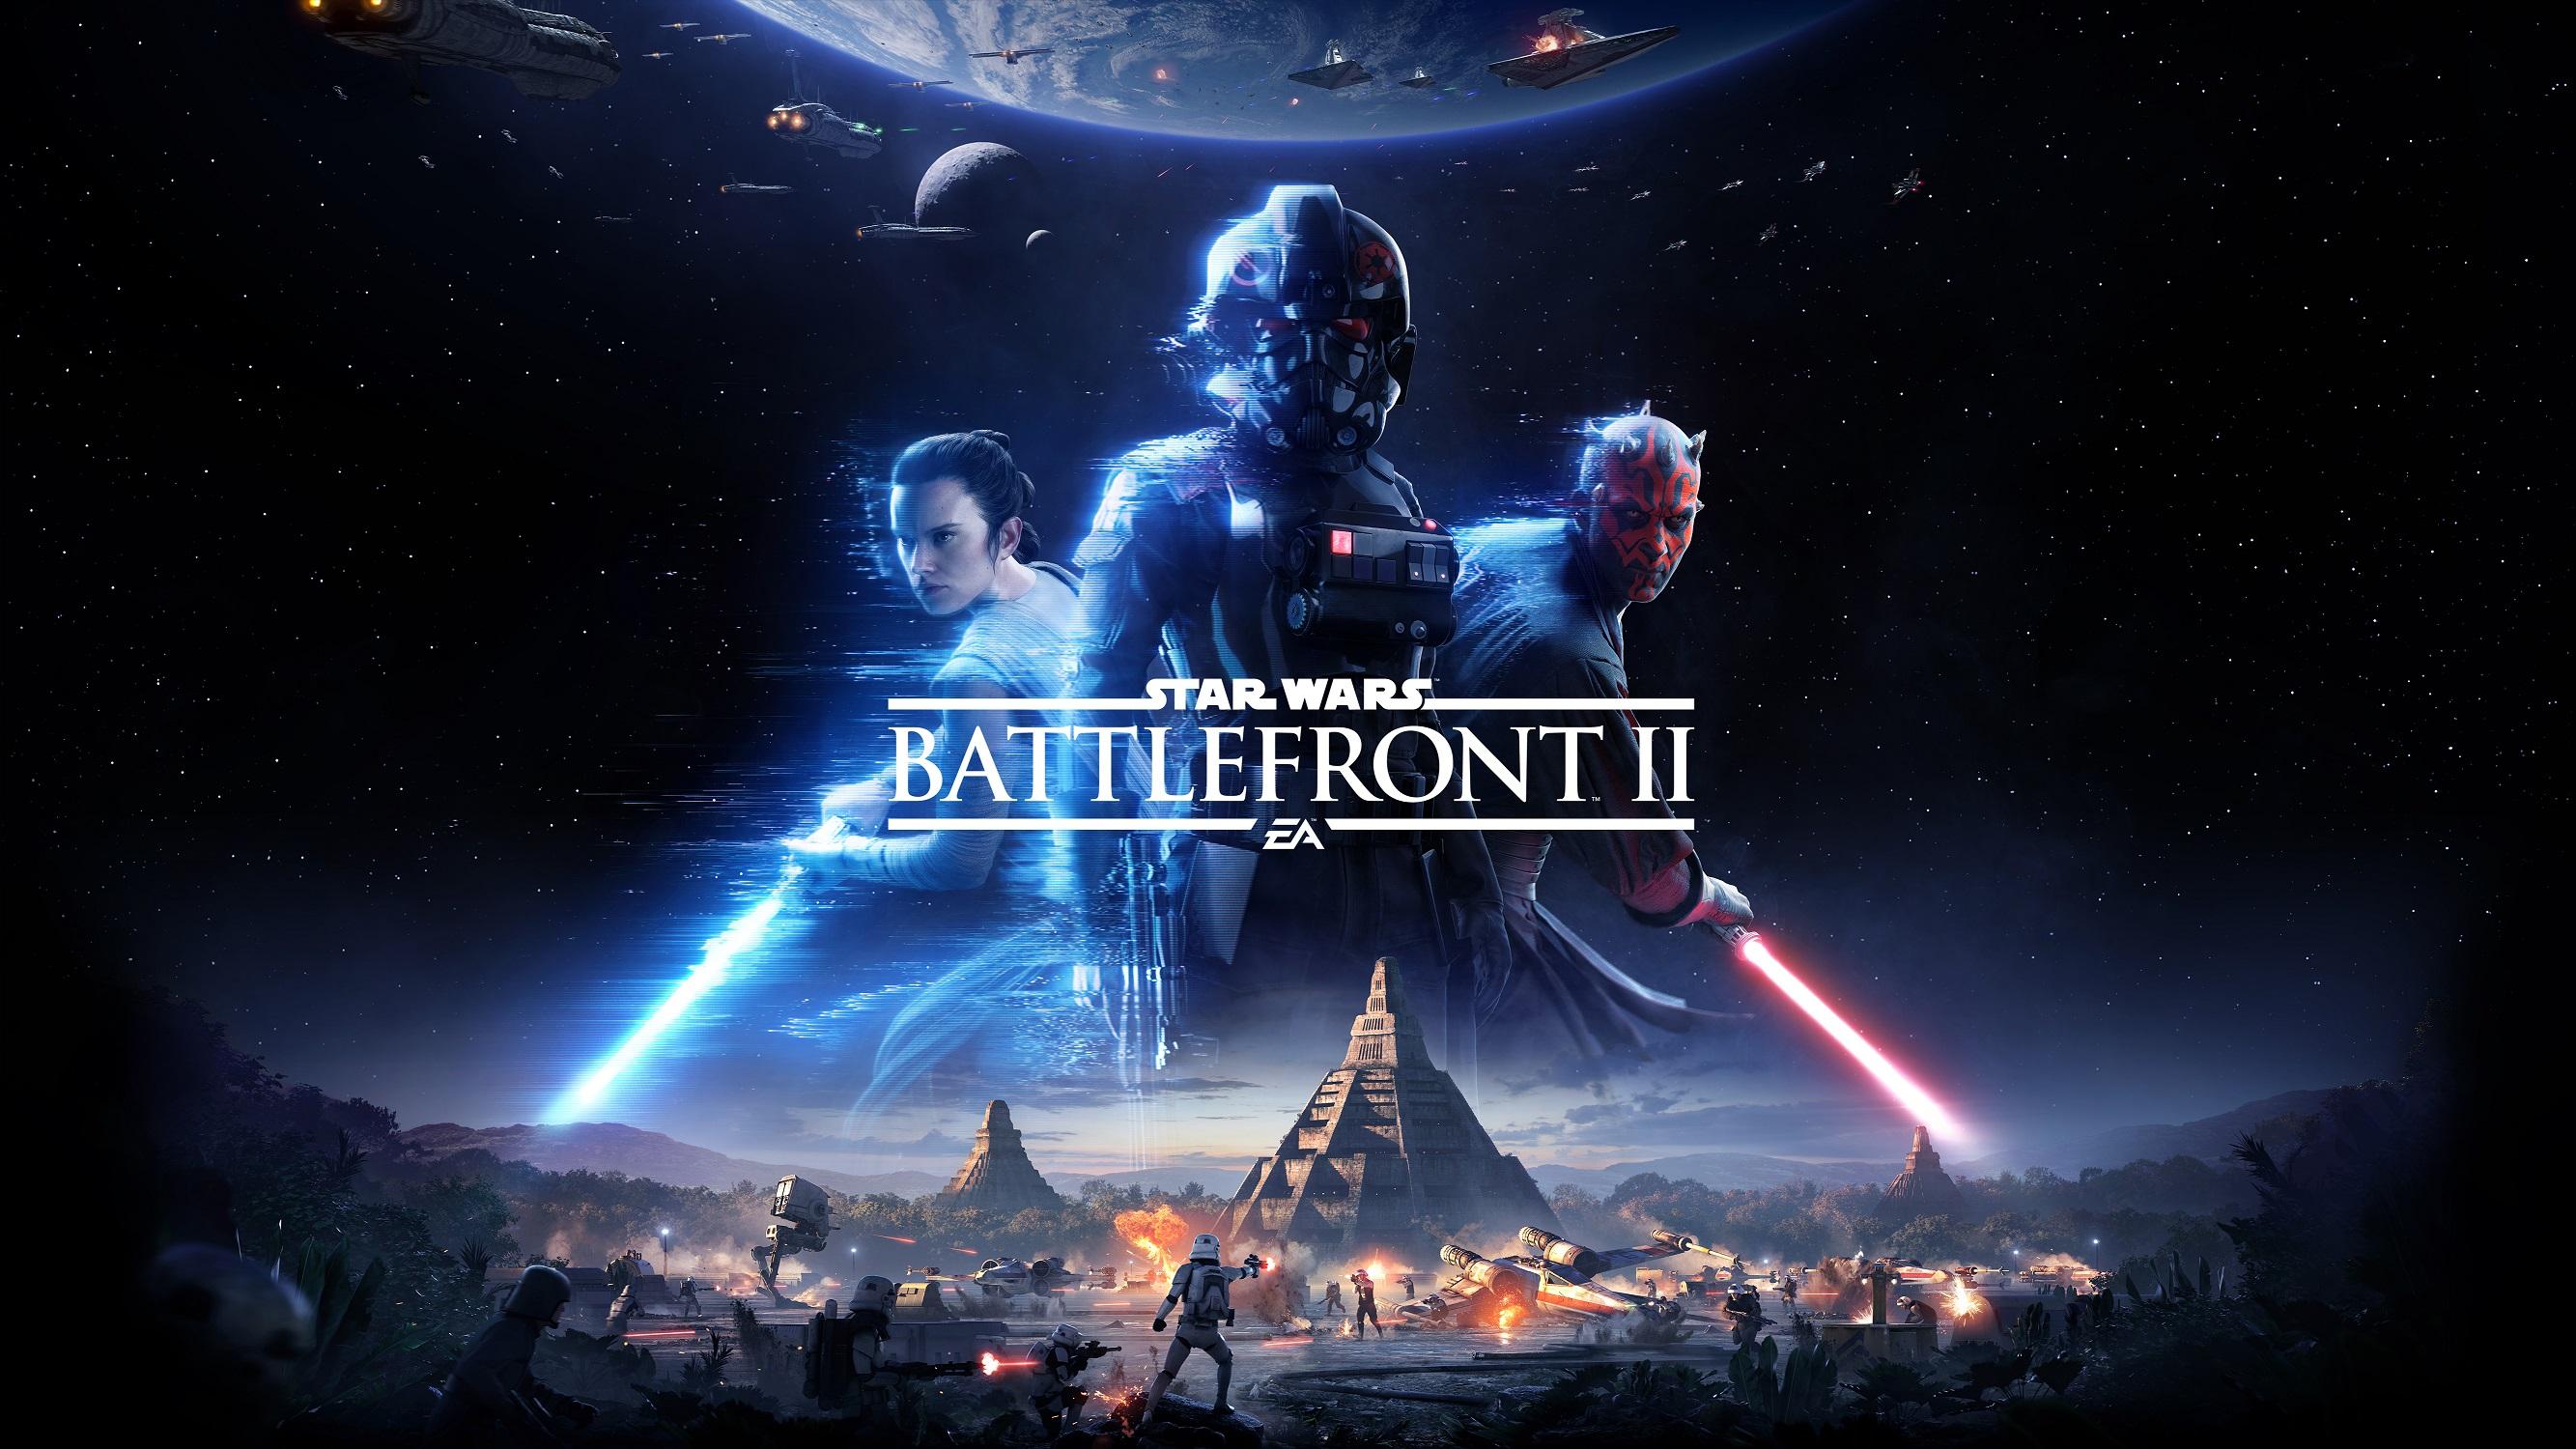 Lucasfilm kommenterer Battlefront II-saken.